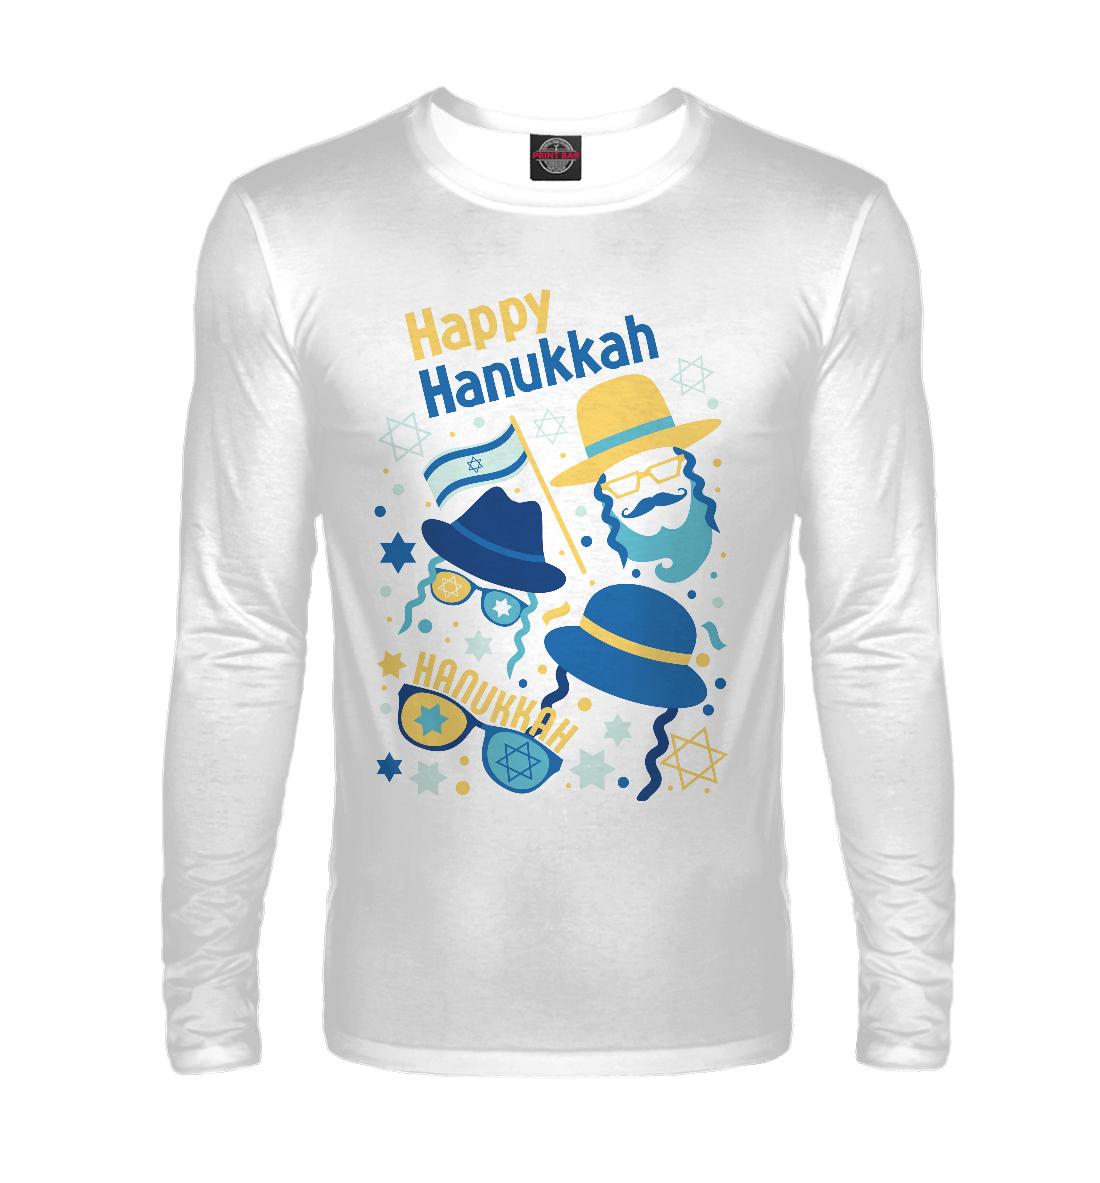 Happy Hanukkah недорого